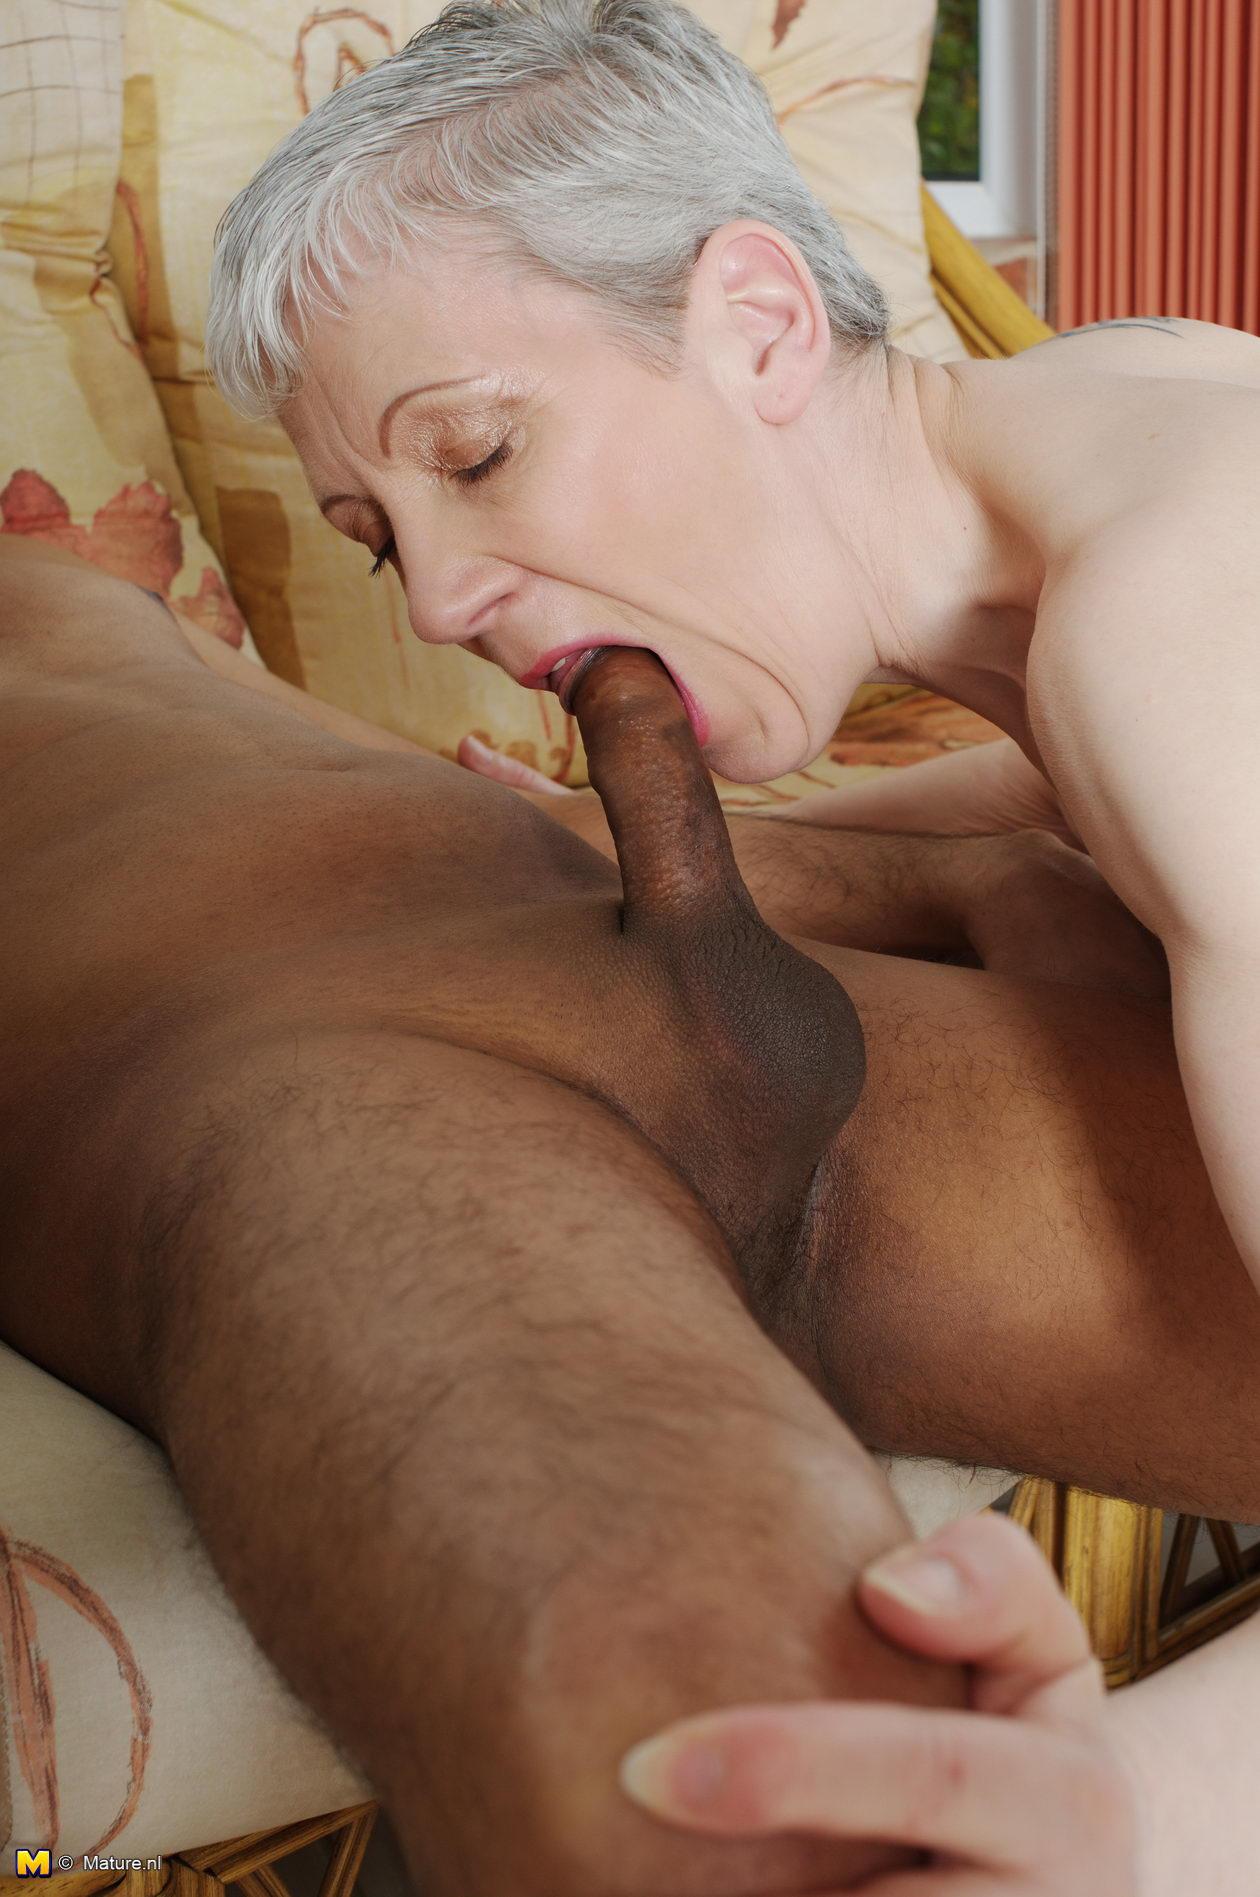 Naked serena williams nude